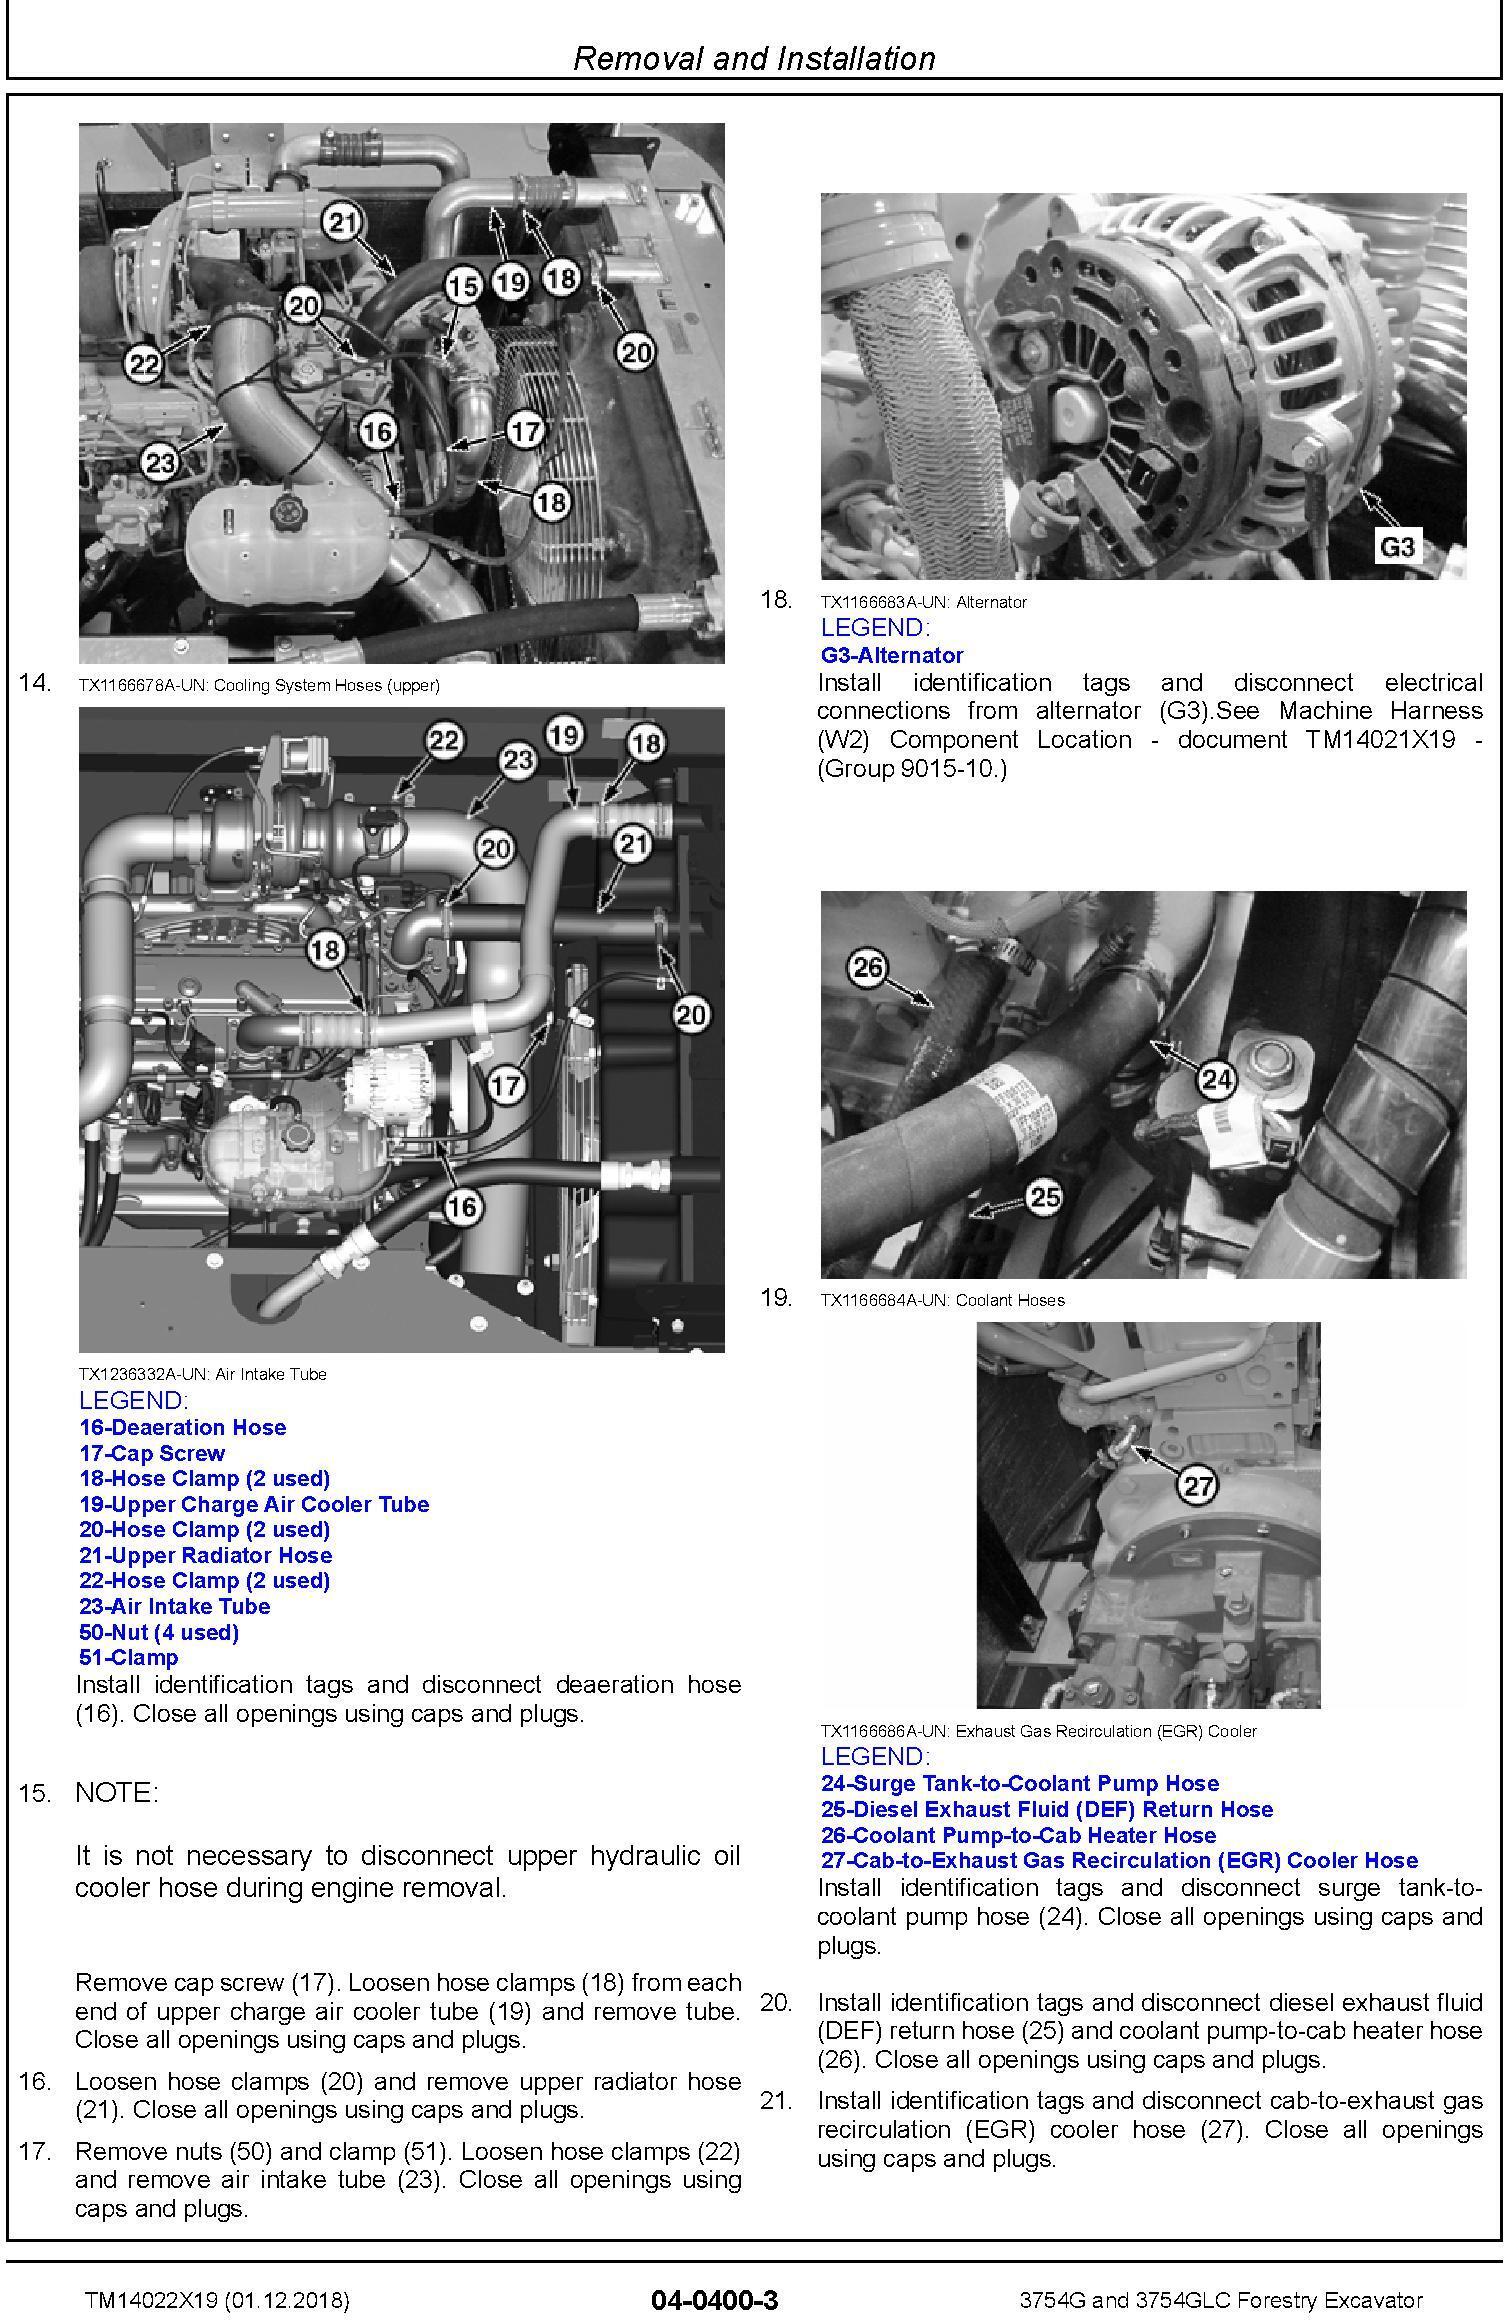 John Deere 3754G and 3754GLC (SN. F371001-) Forestry Excavator Repair Technical Manual (TM14022X19) - 2